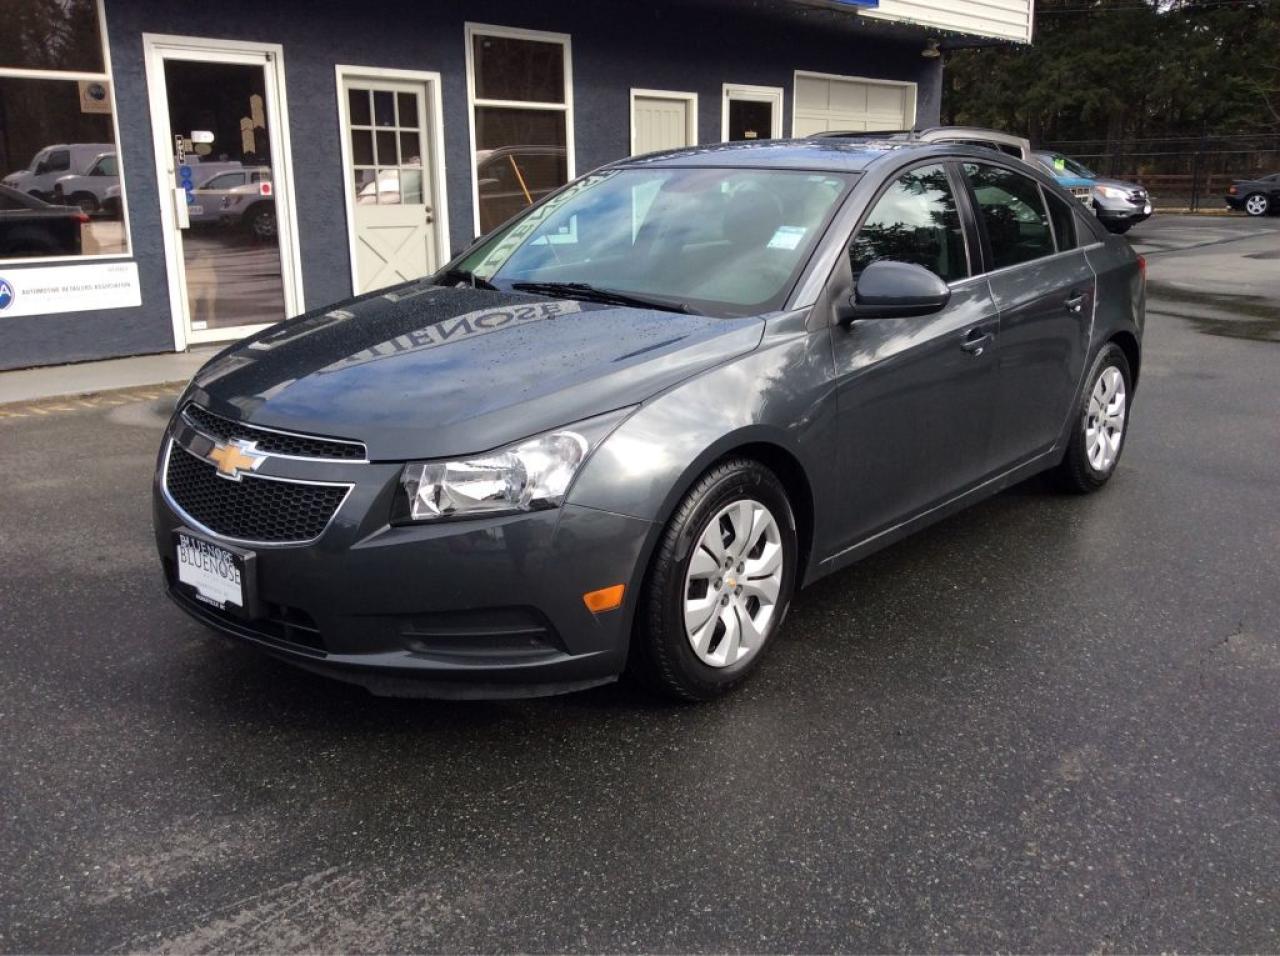 Photo of Grey 2013 Chevrolet Cruze